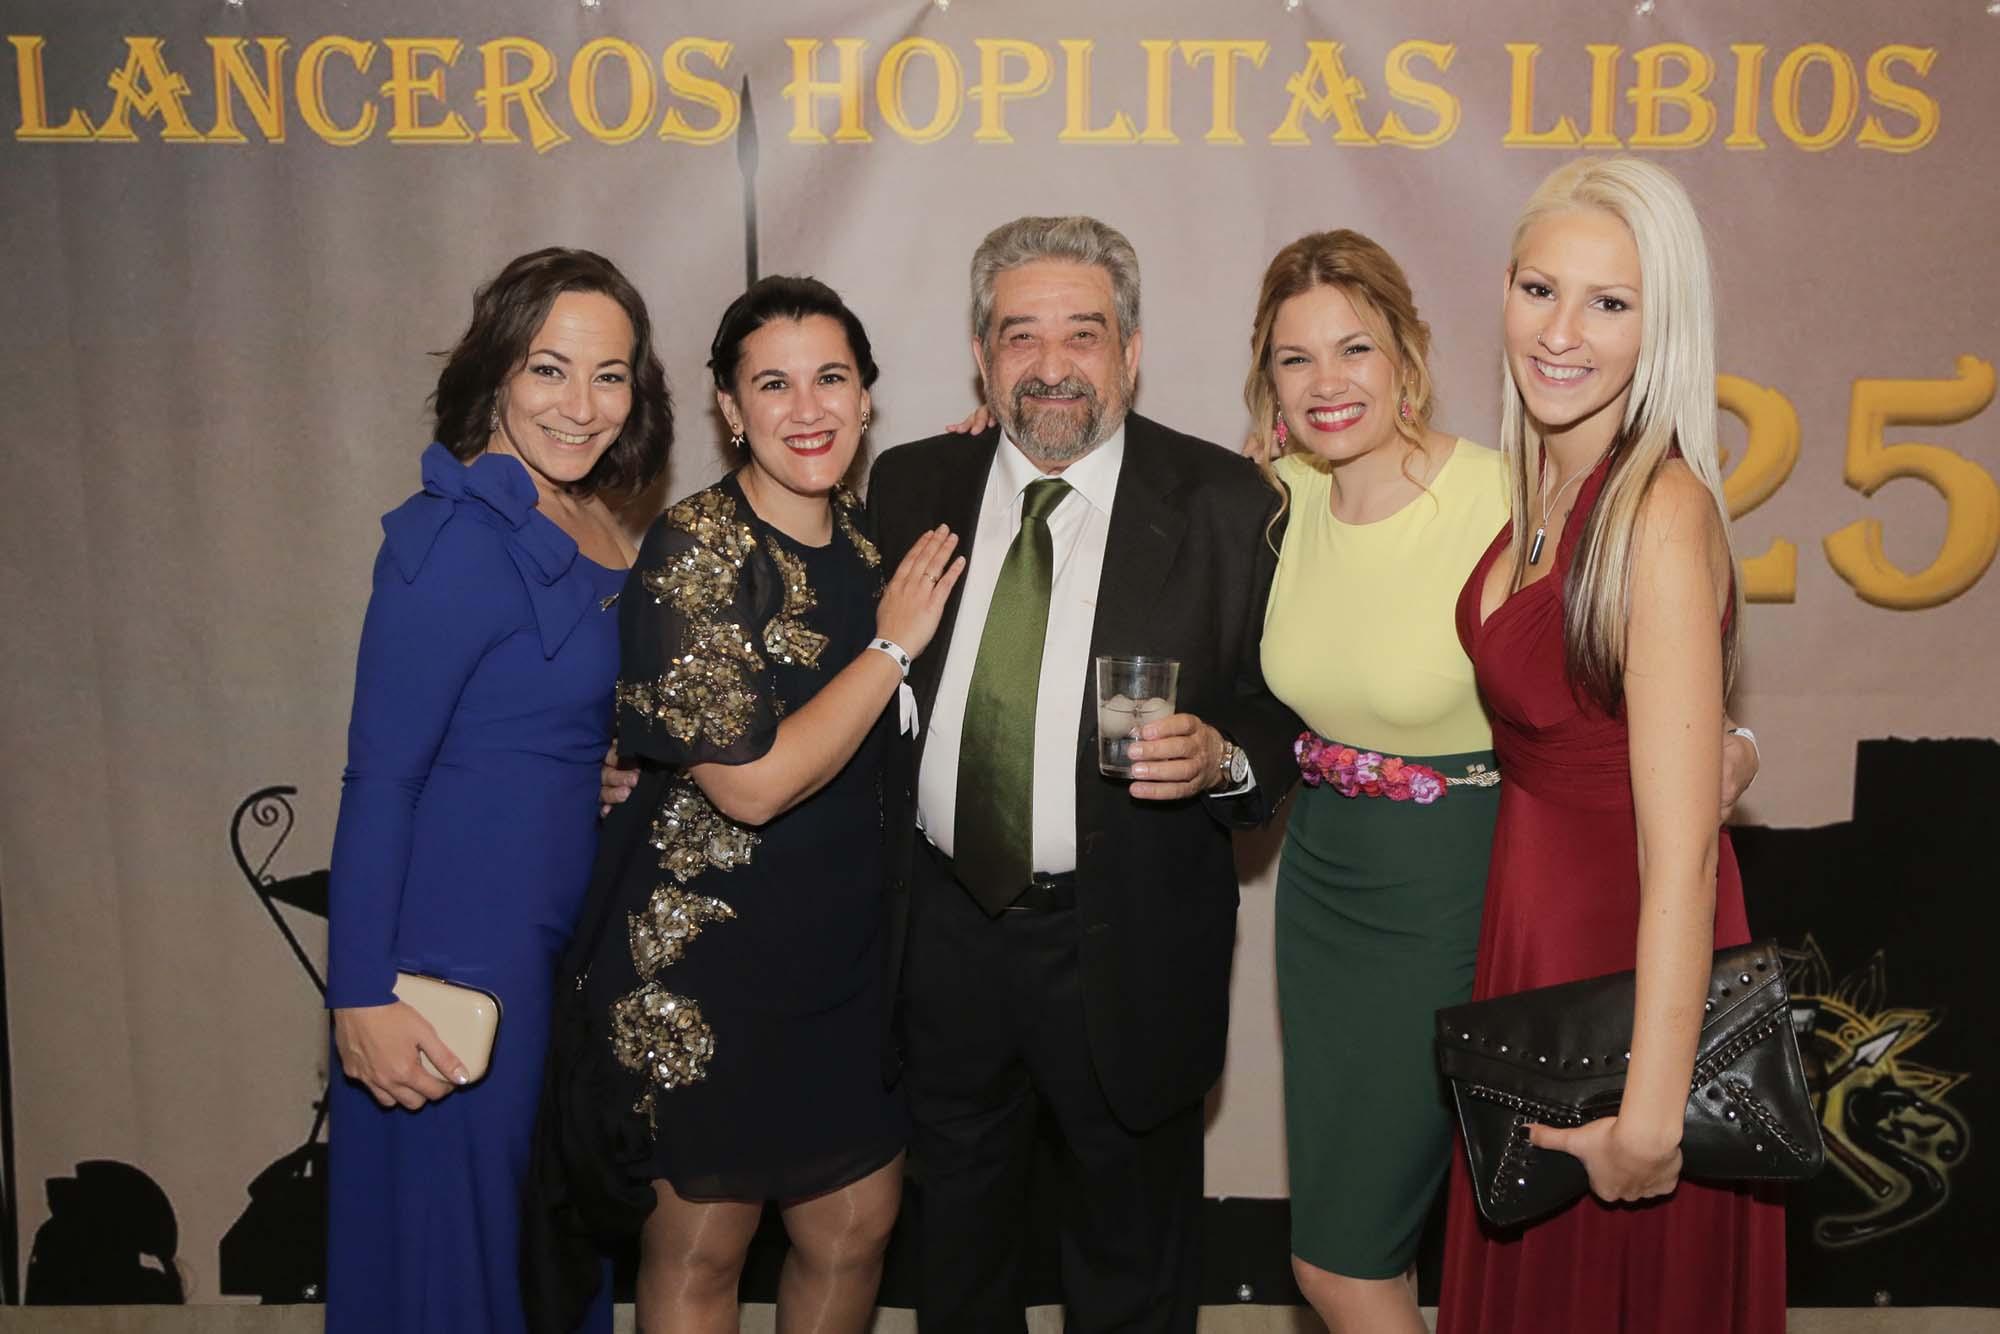 Lanceros Hoplitas Libios  (224)